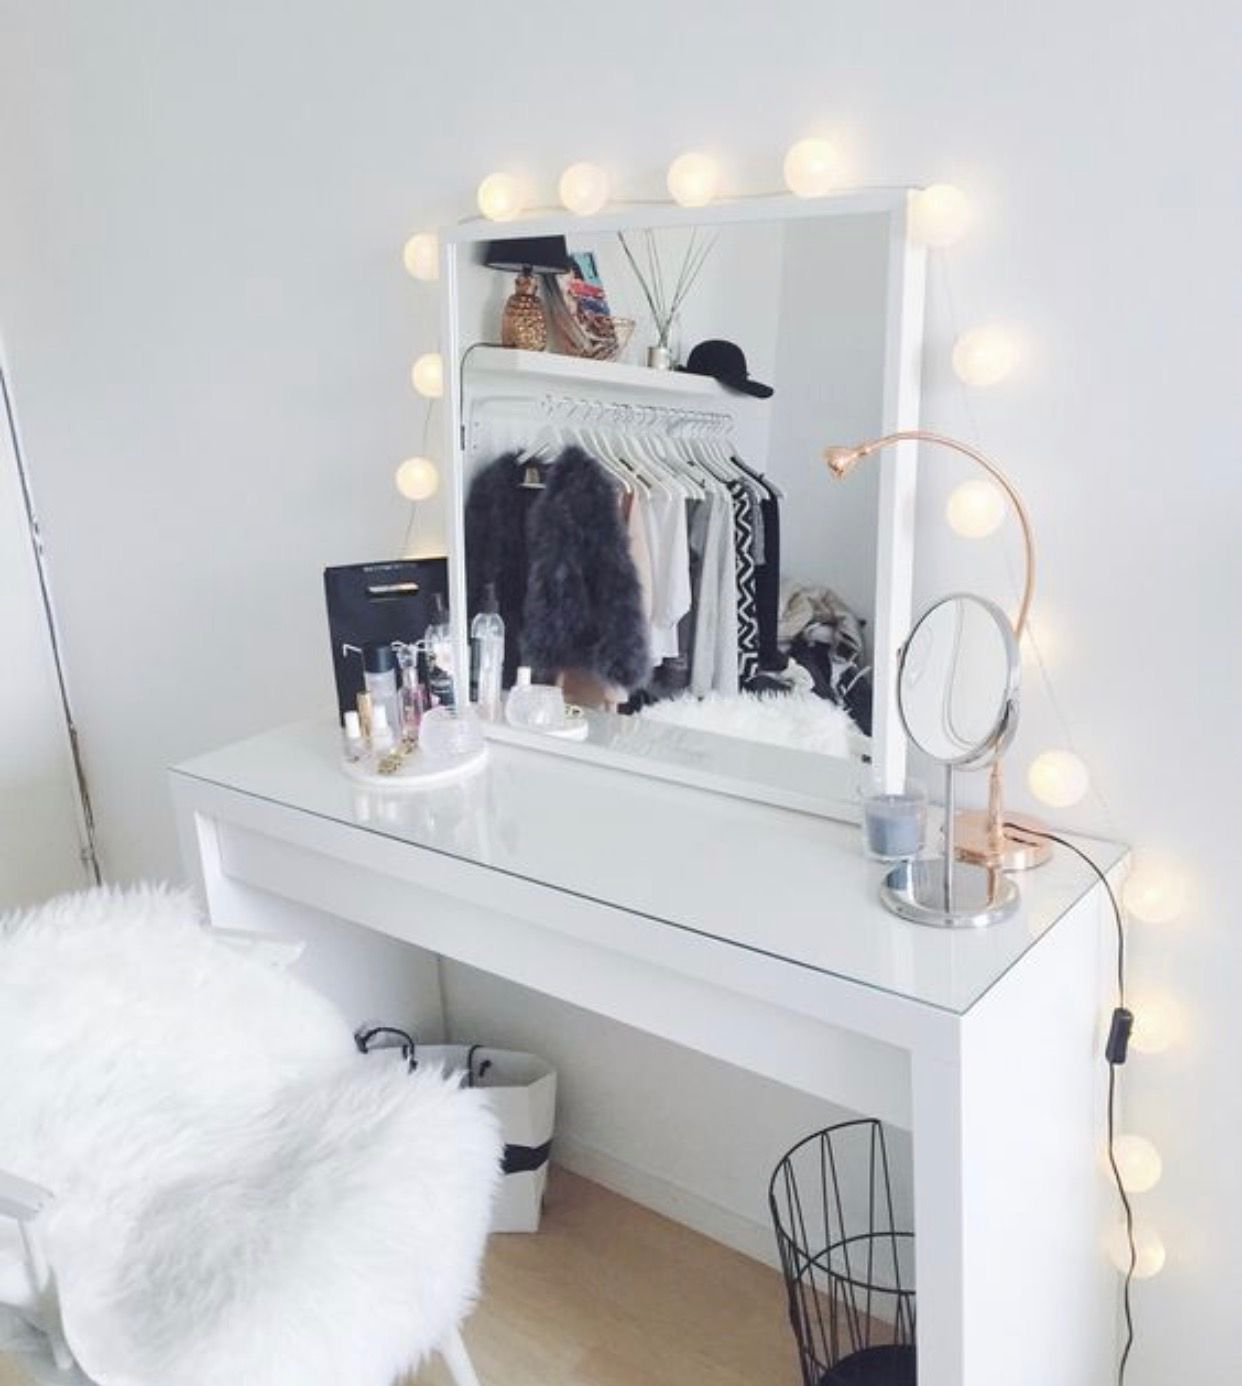 Aesthetic Makeup Desk in 2020 Room inspiration, Room